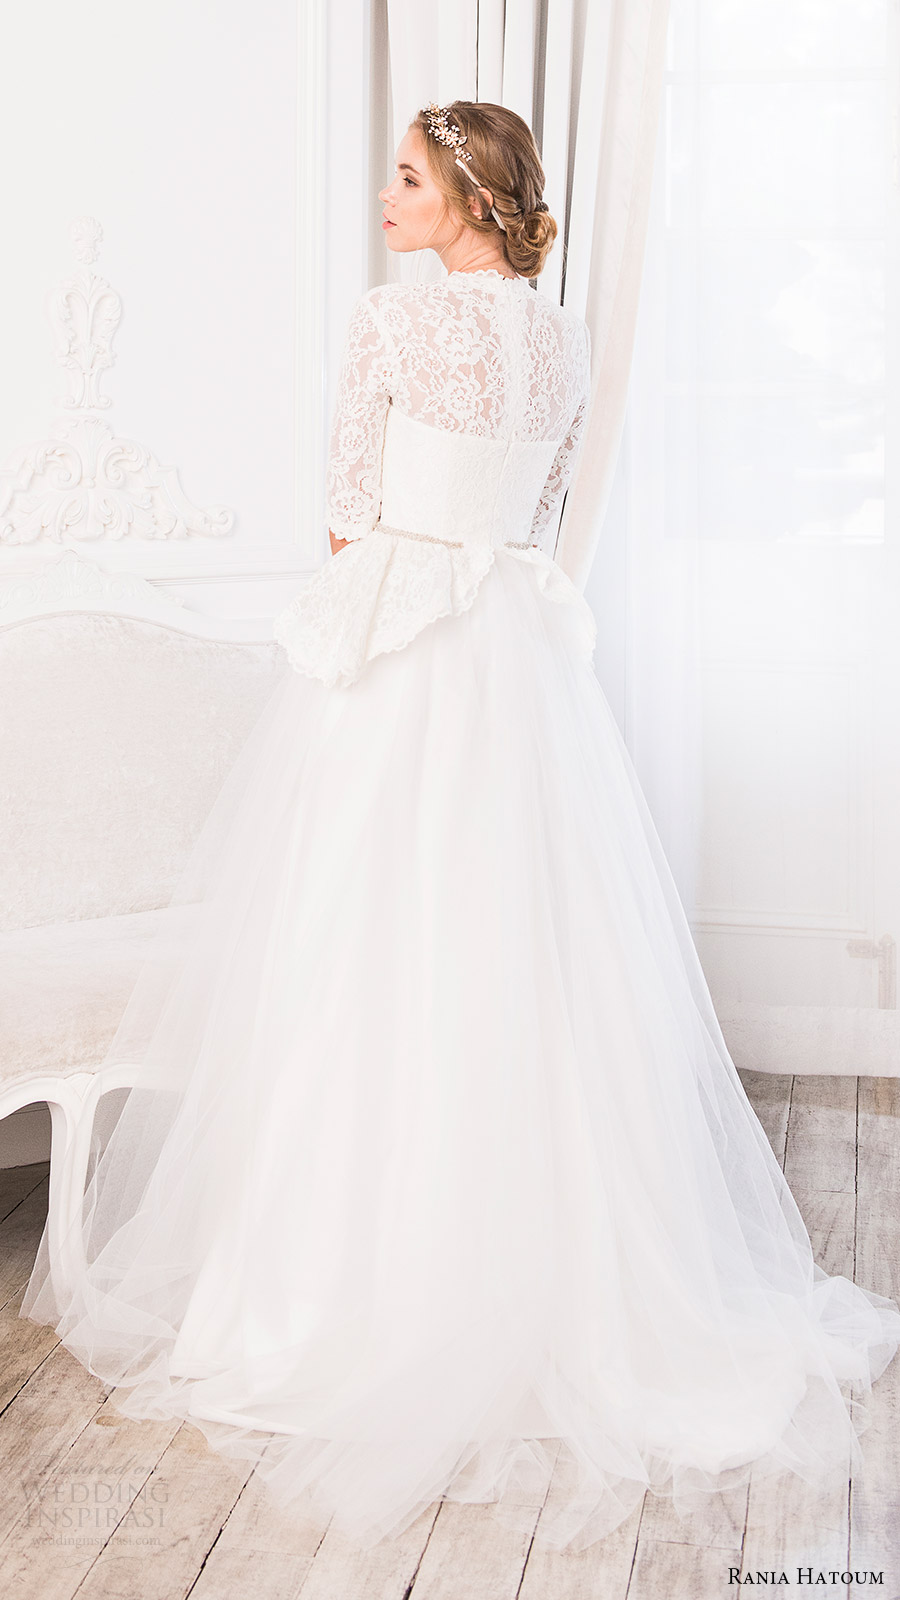 rania hatoum bridal spring 2017 3 quarter sleeve lace peplum bodice v neck ball gown wedding dress (serena) bv train